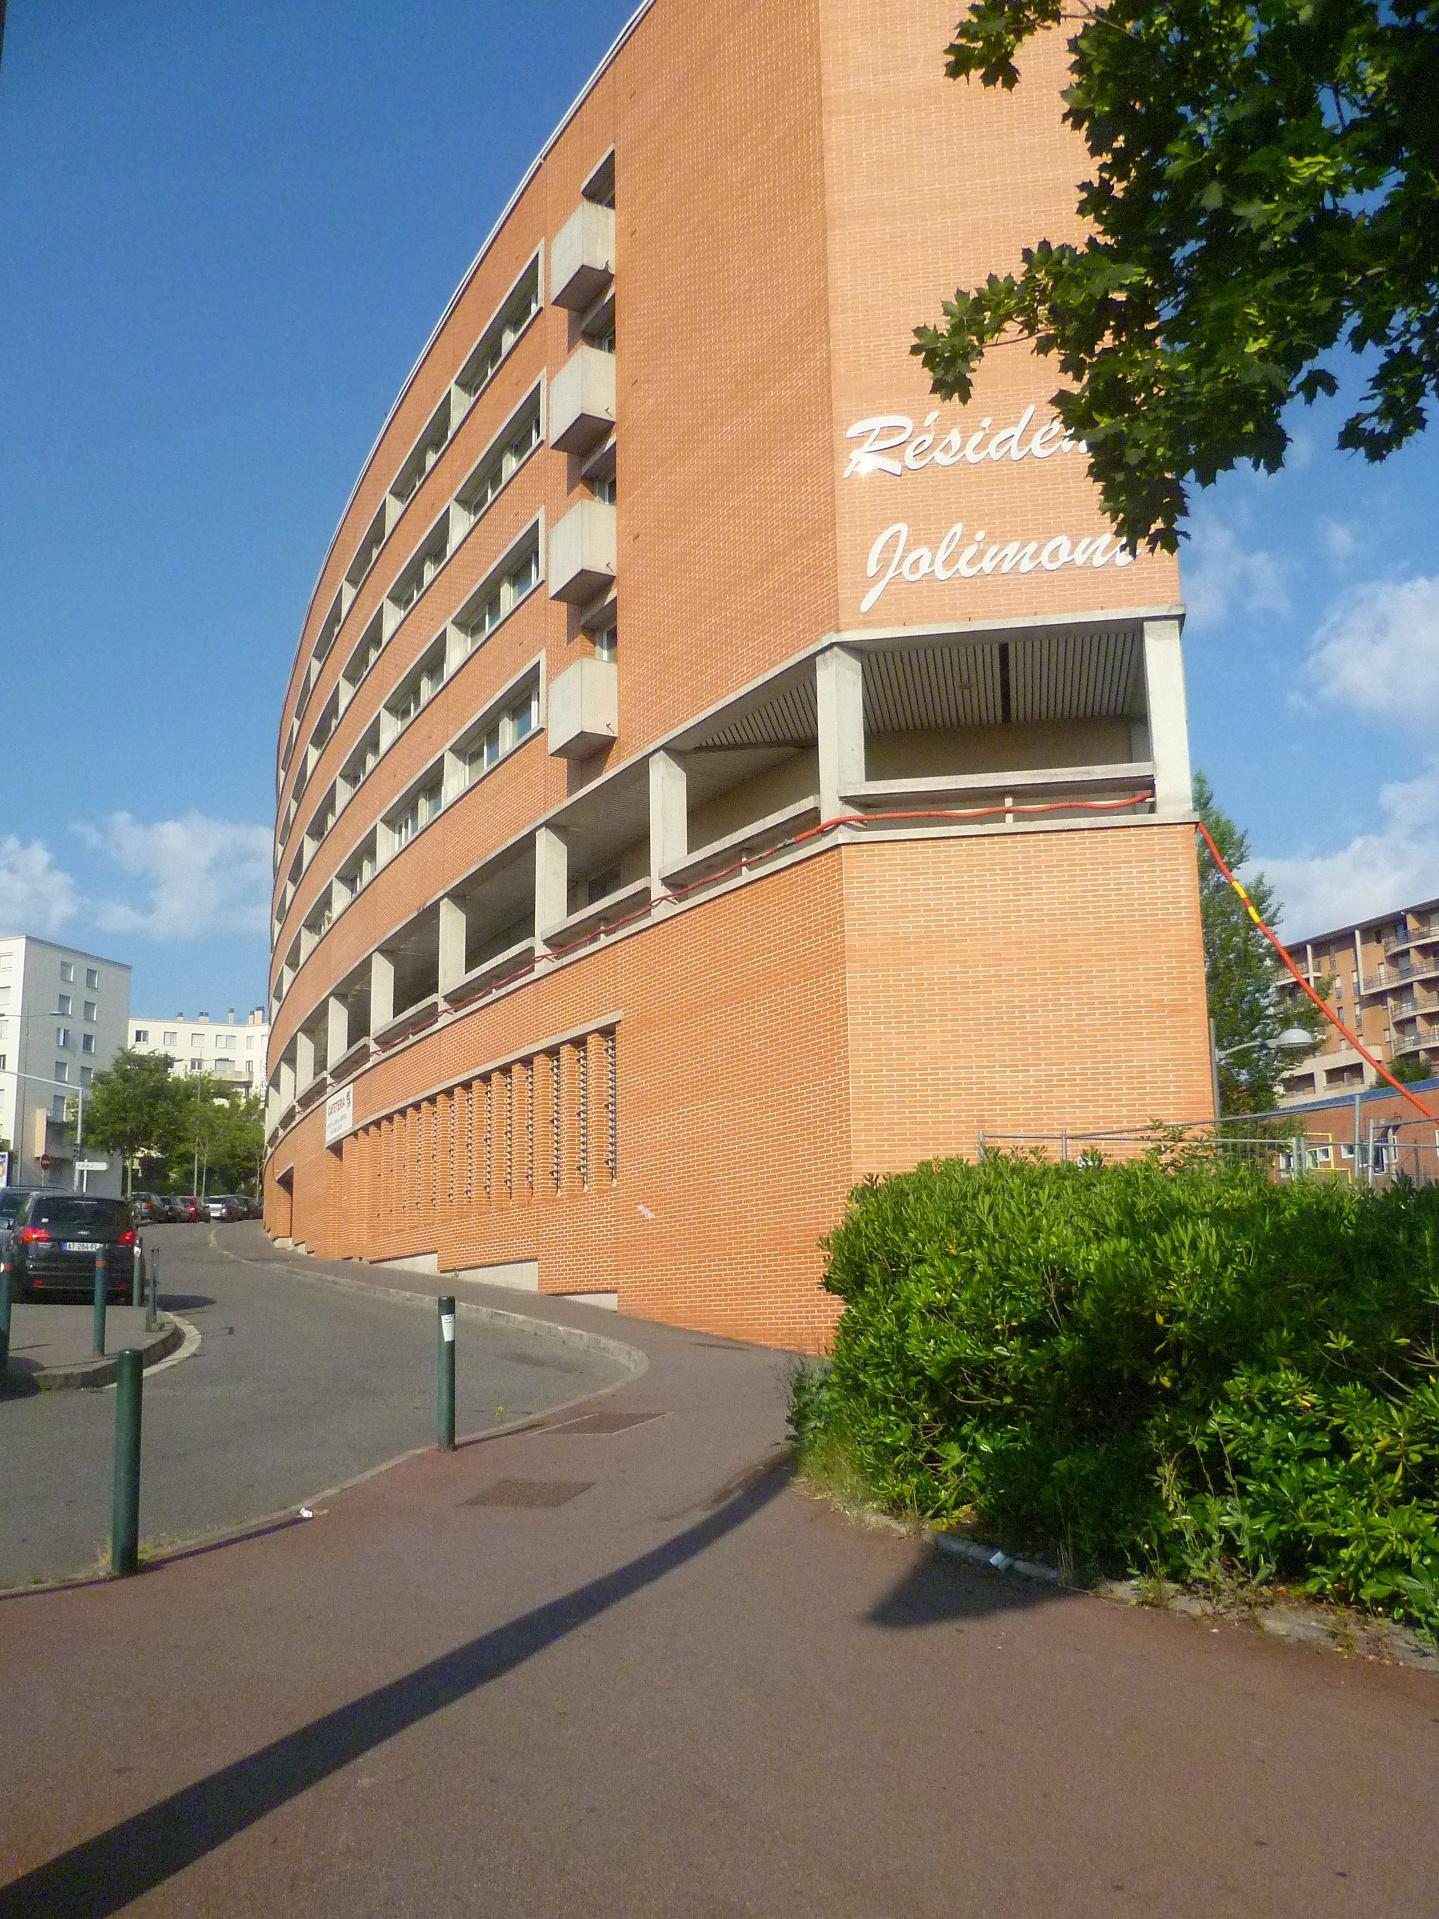 Résidence Jolimont